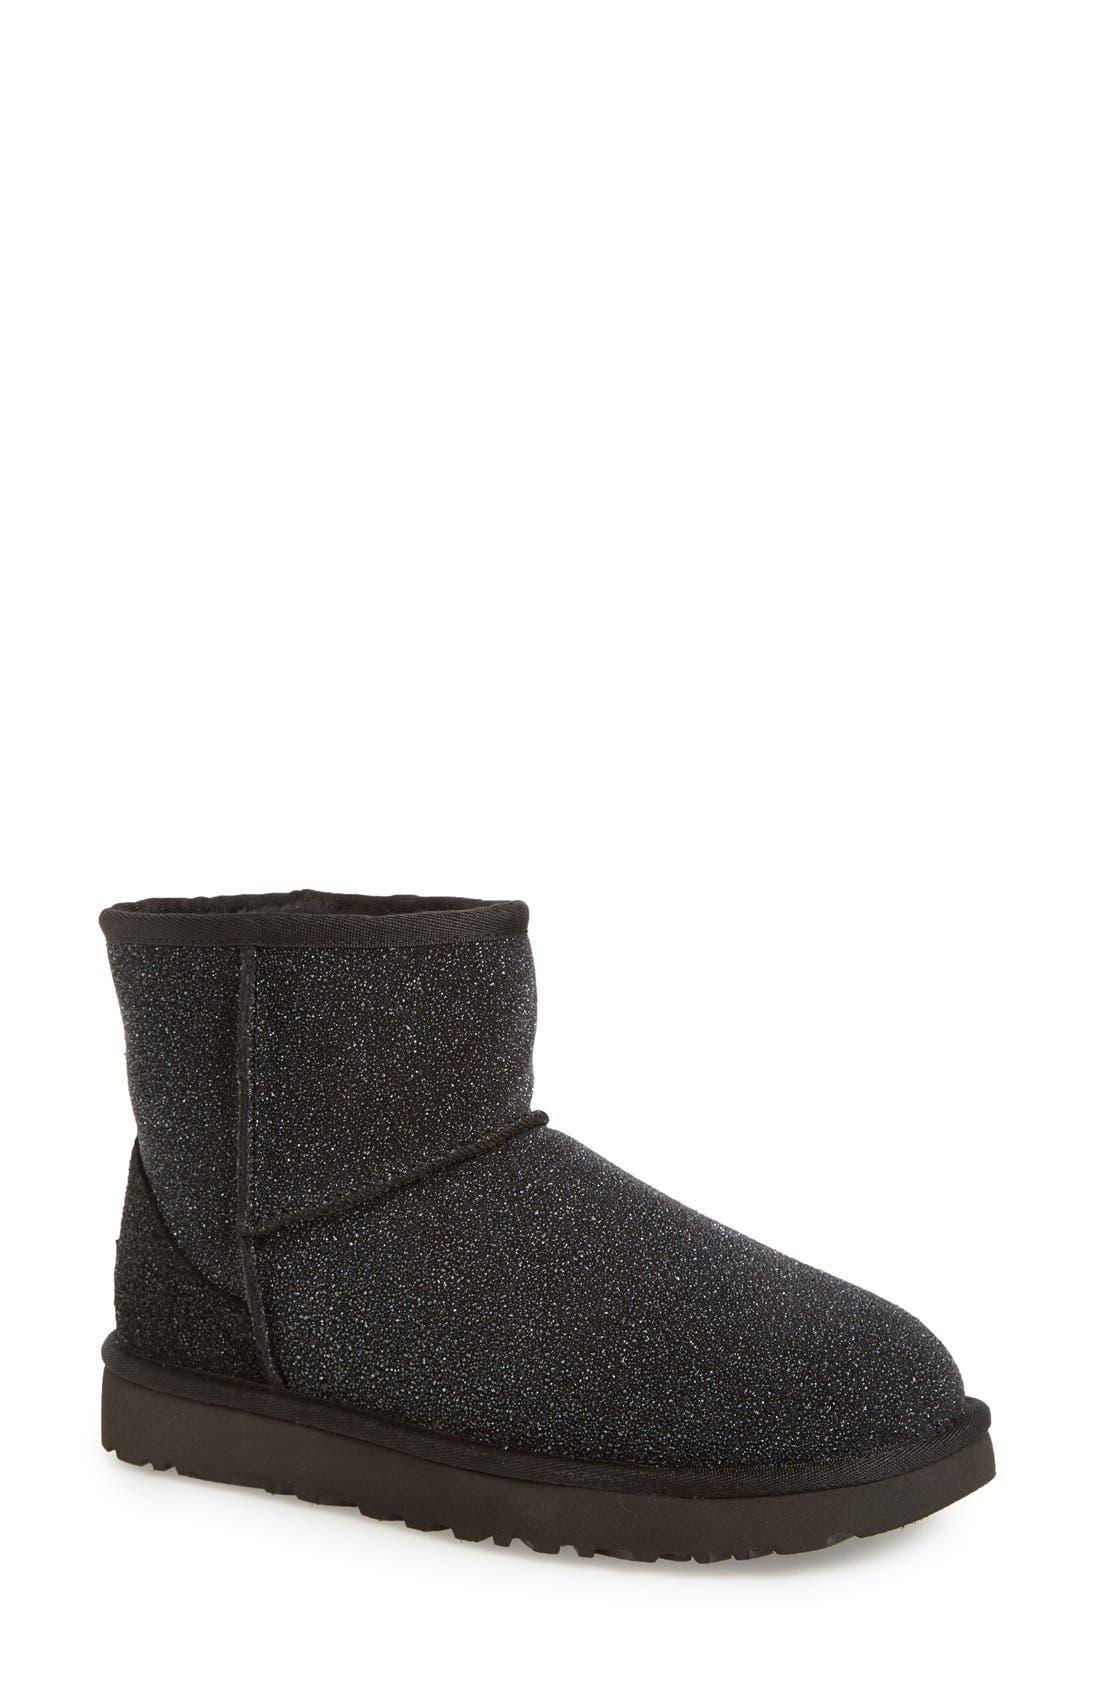 87e08eae3ff97 ... shopping ugg classic mini serein genuine shearling boot e770b fcd9e